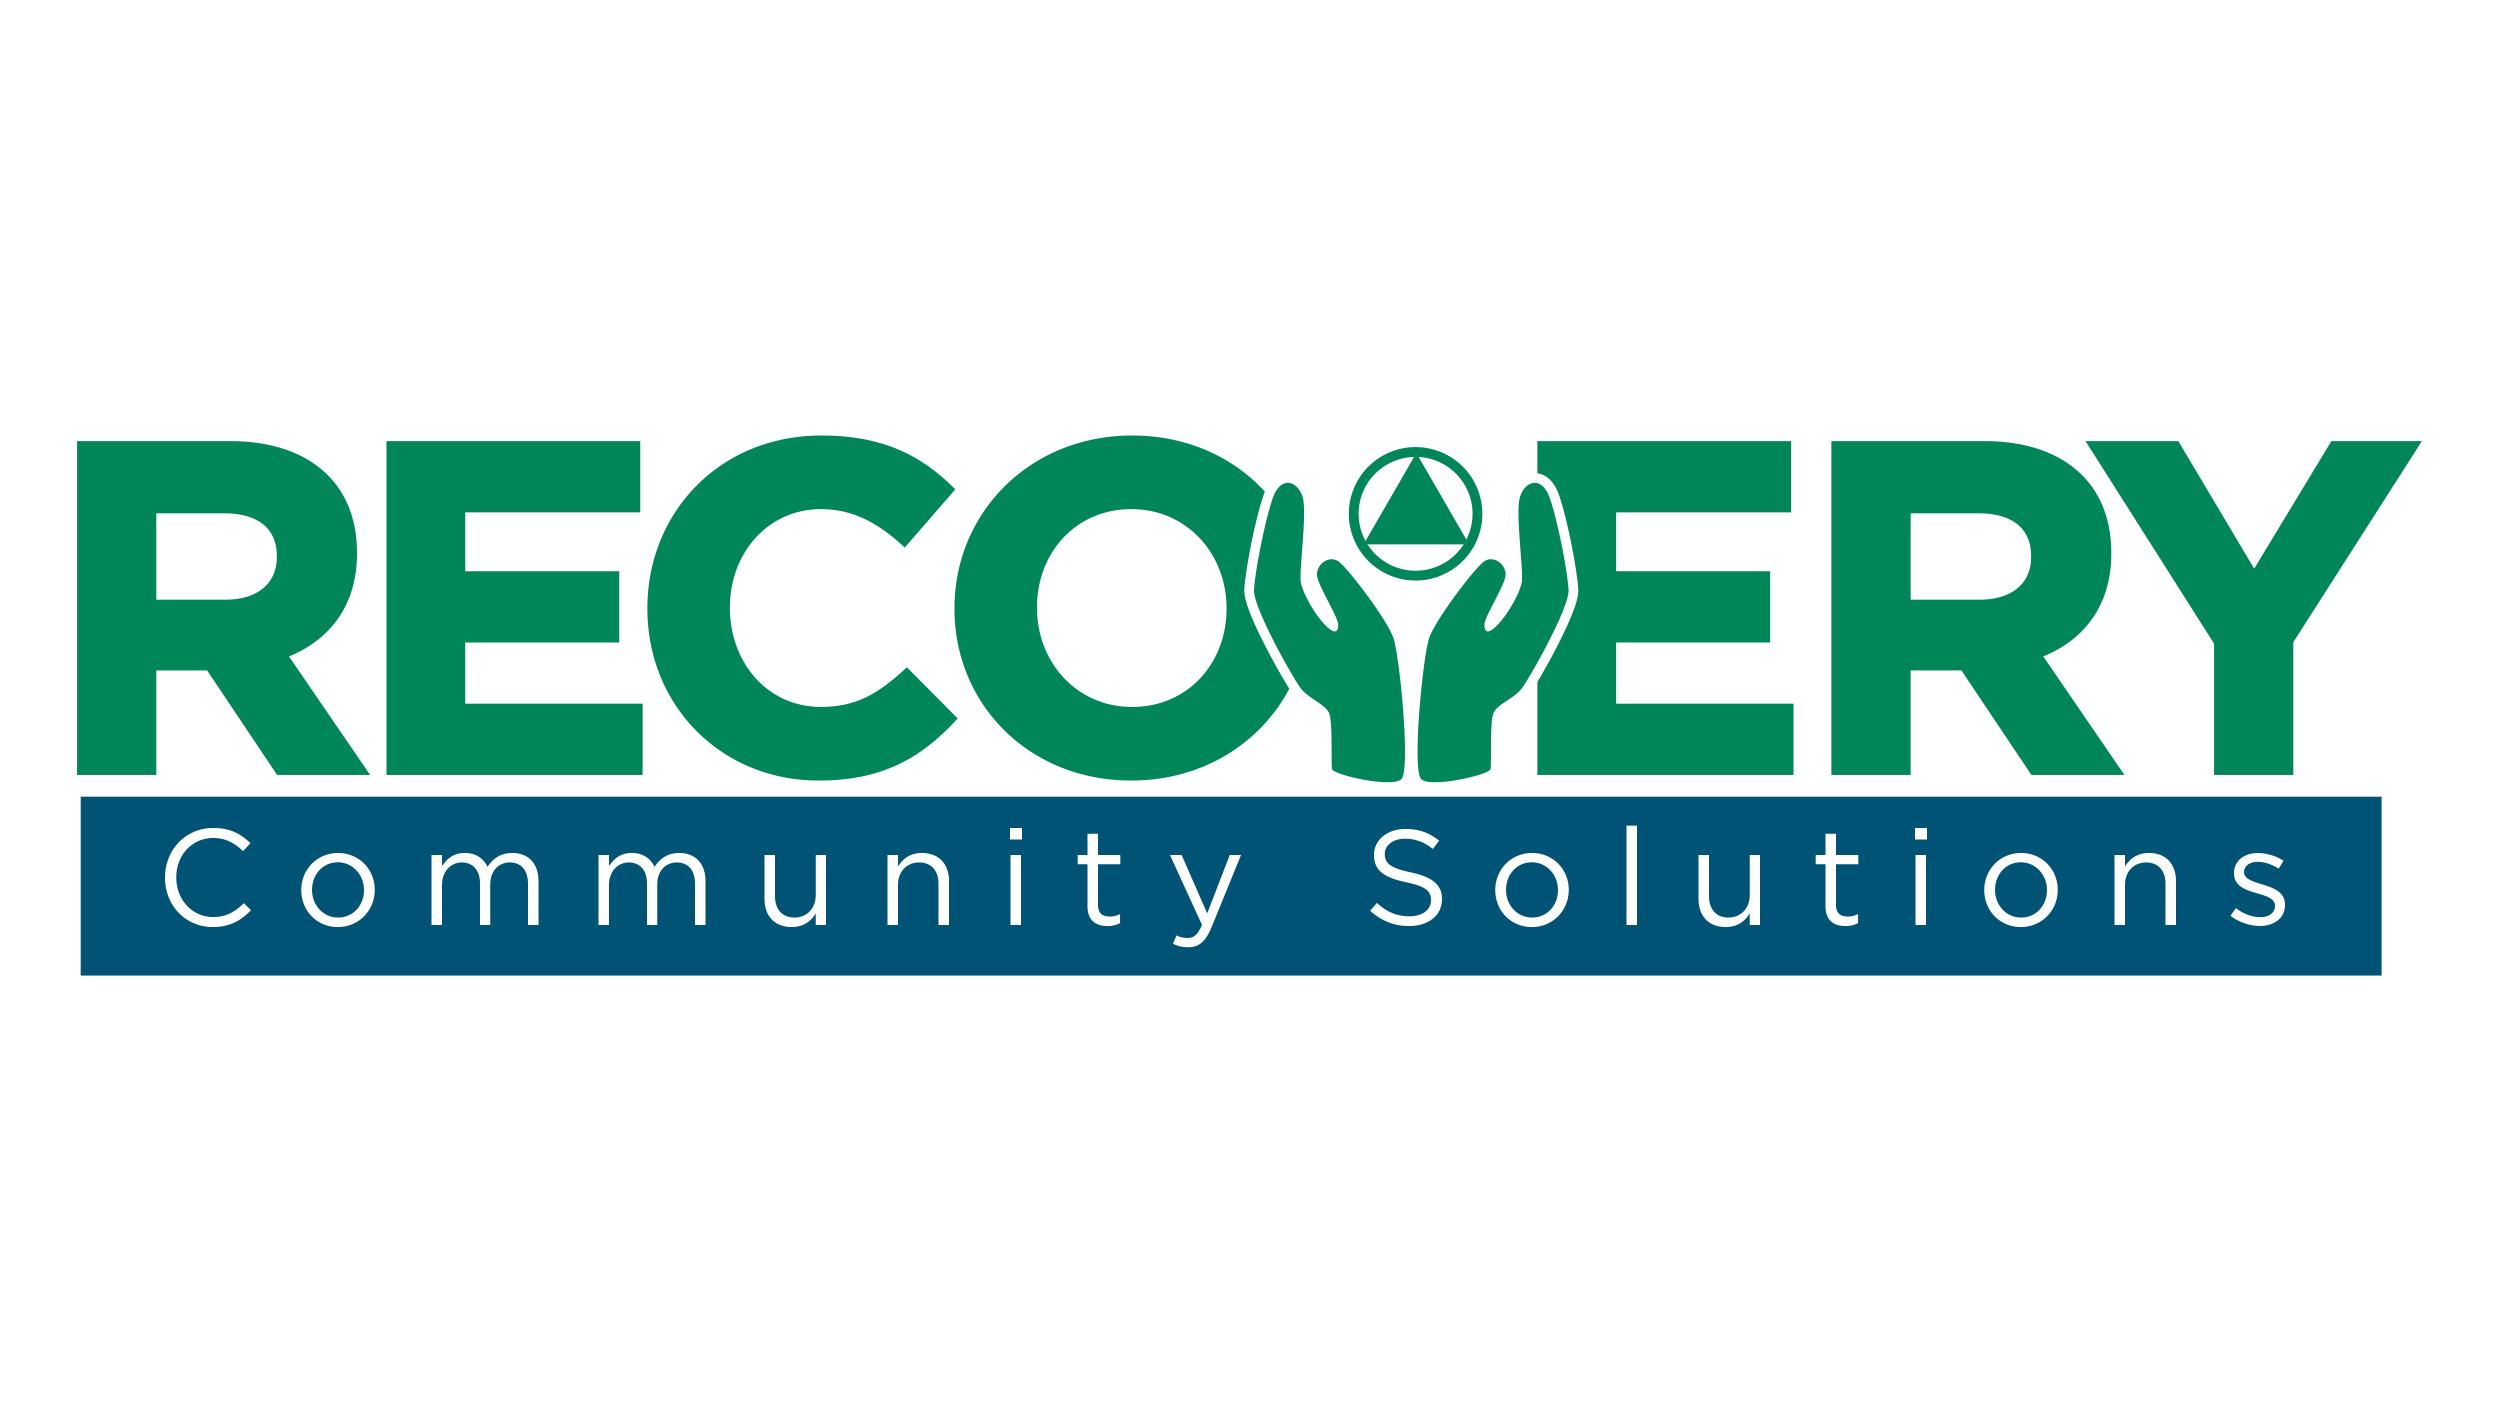 Recovery-Community-Solutions-Logos-Brand-Identity.jpg